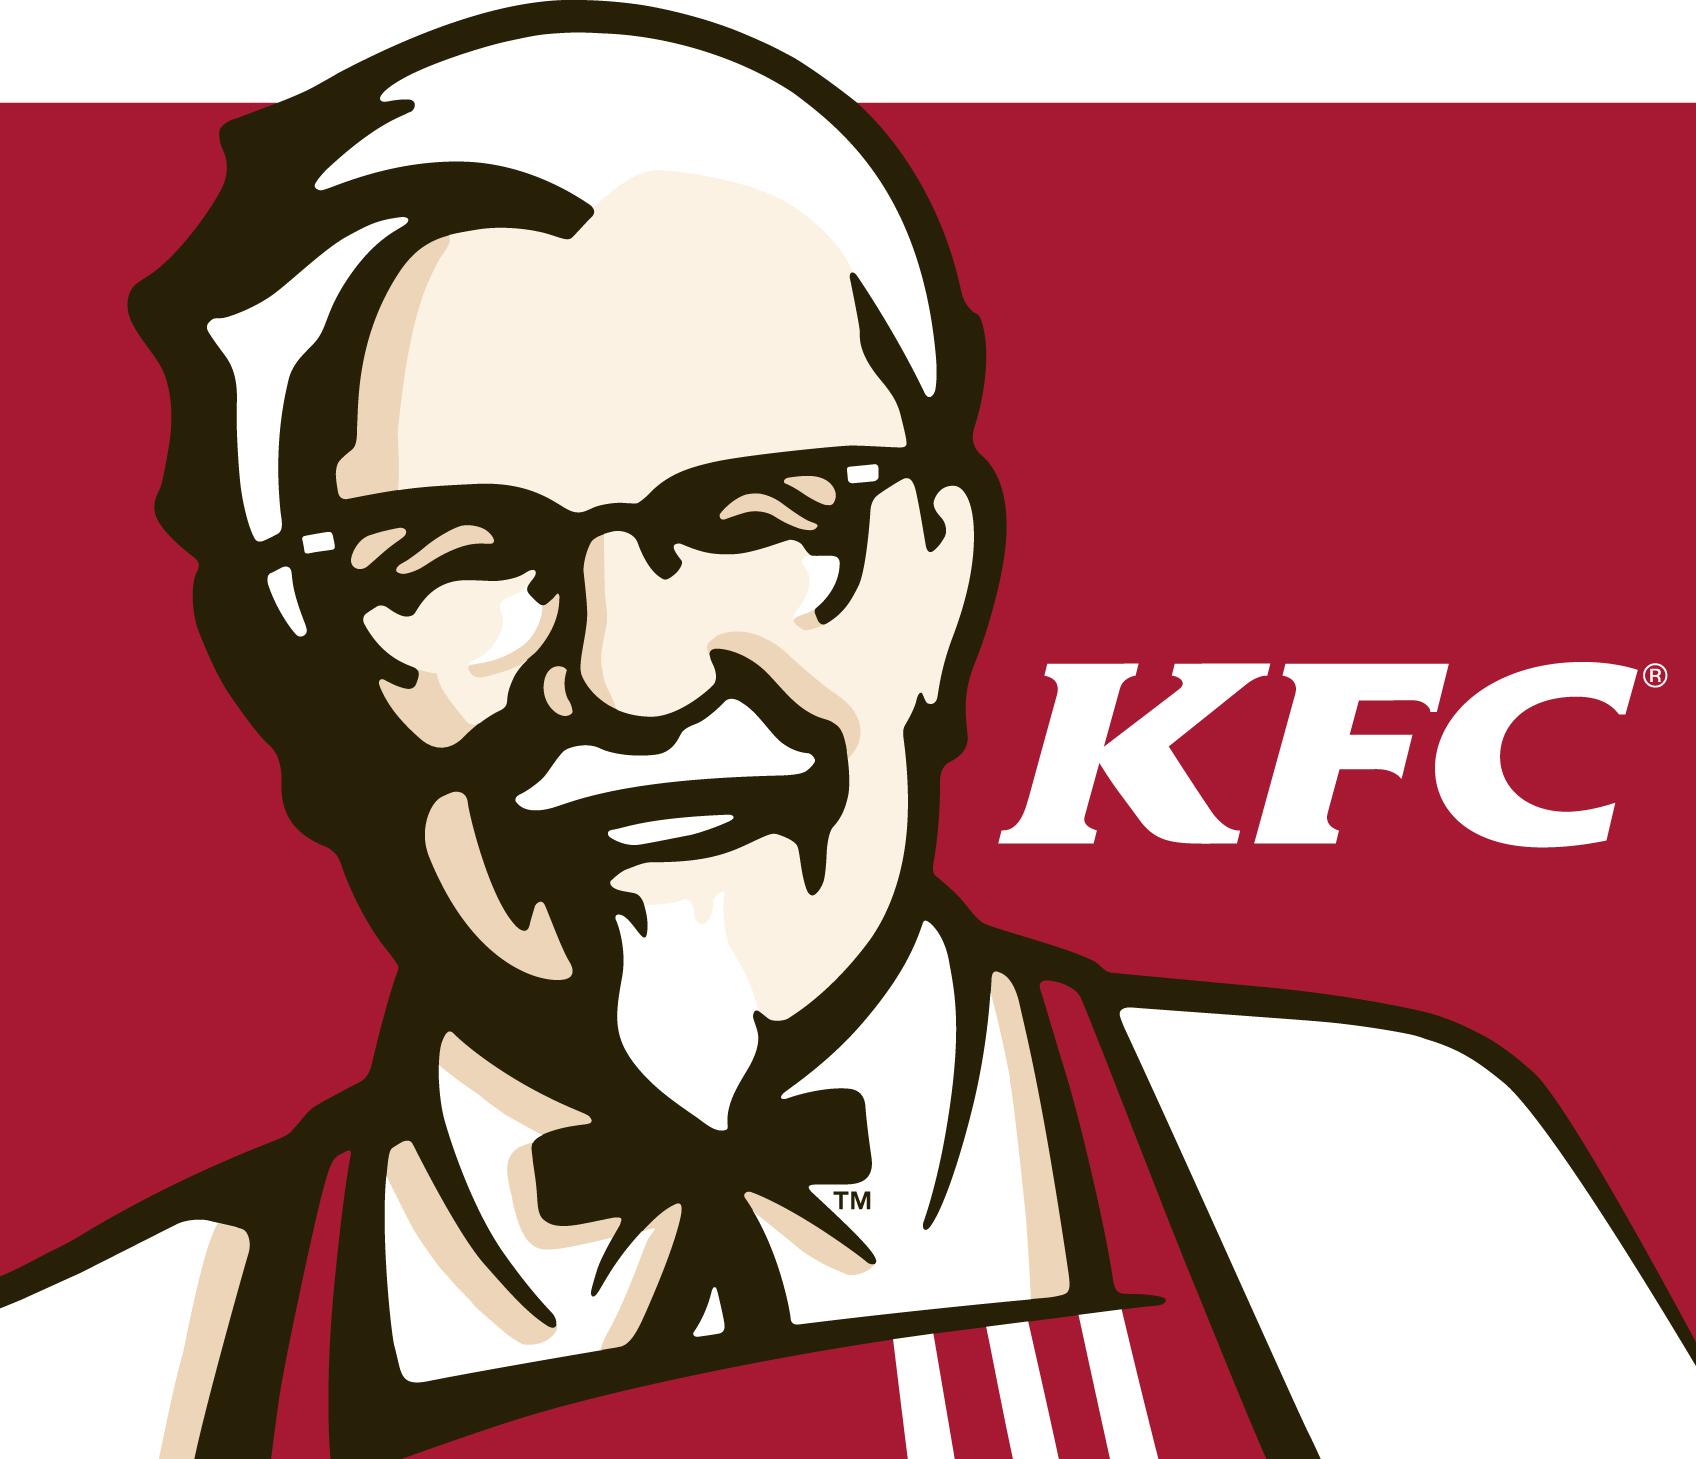 Free KFC Bucket Cliparts, Download Free Clip Art, Free Clip.